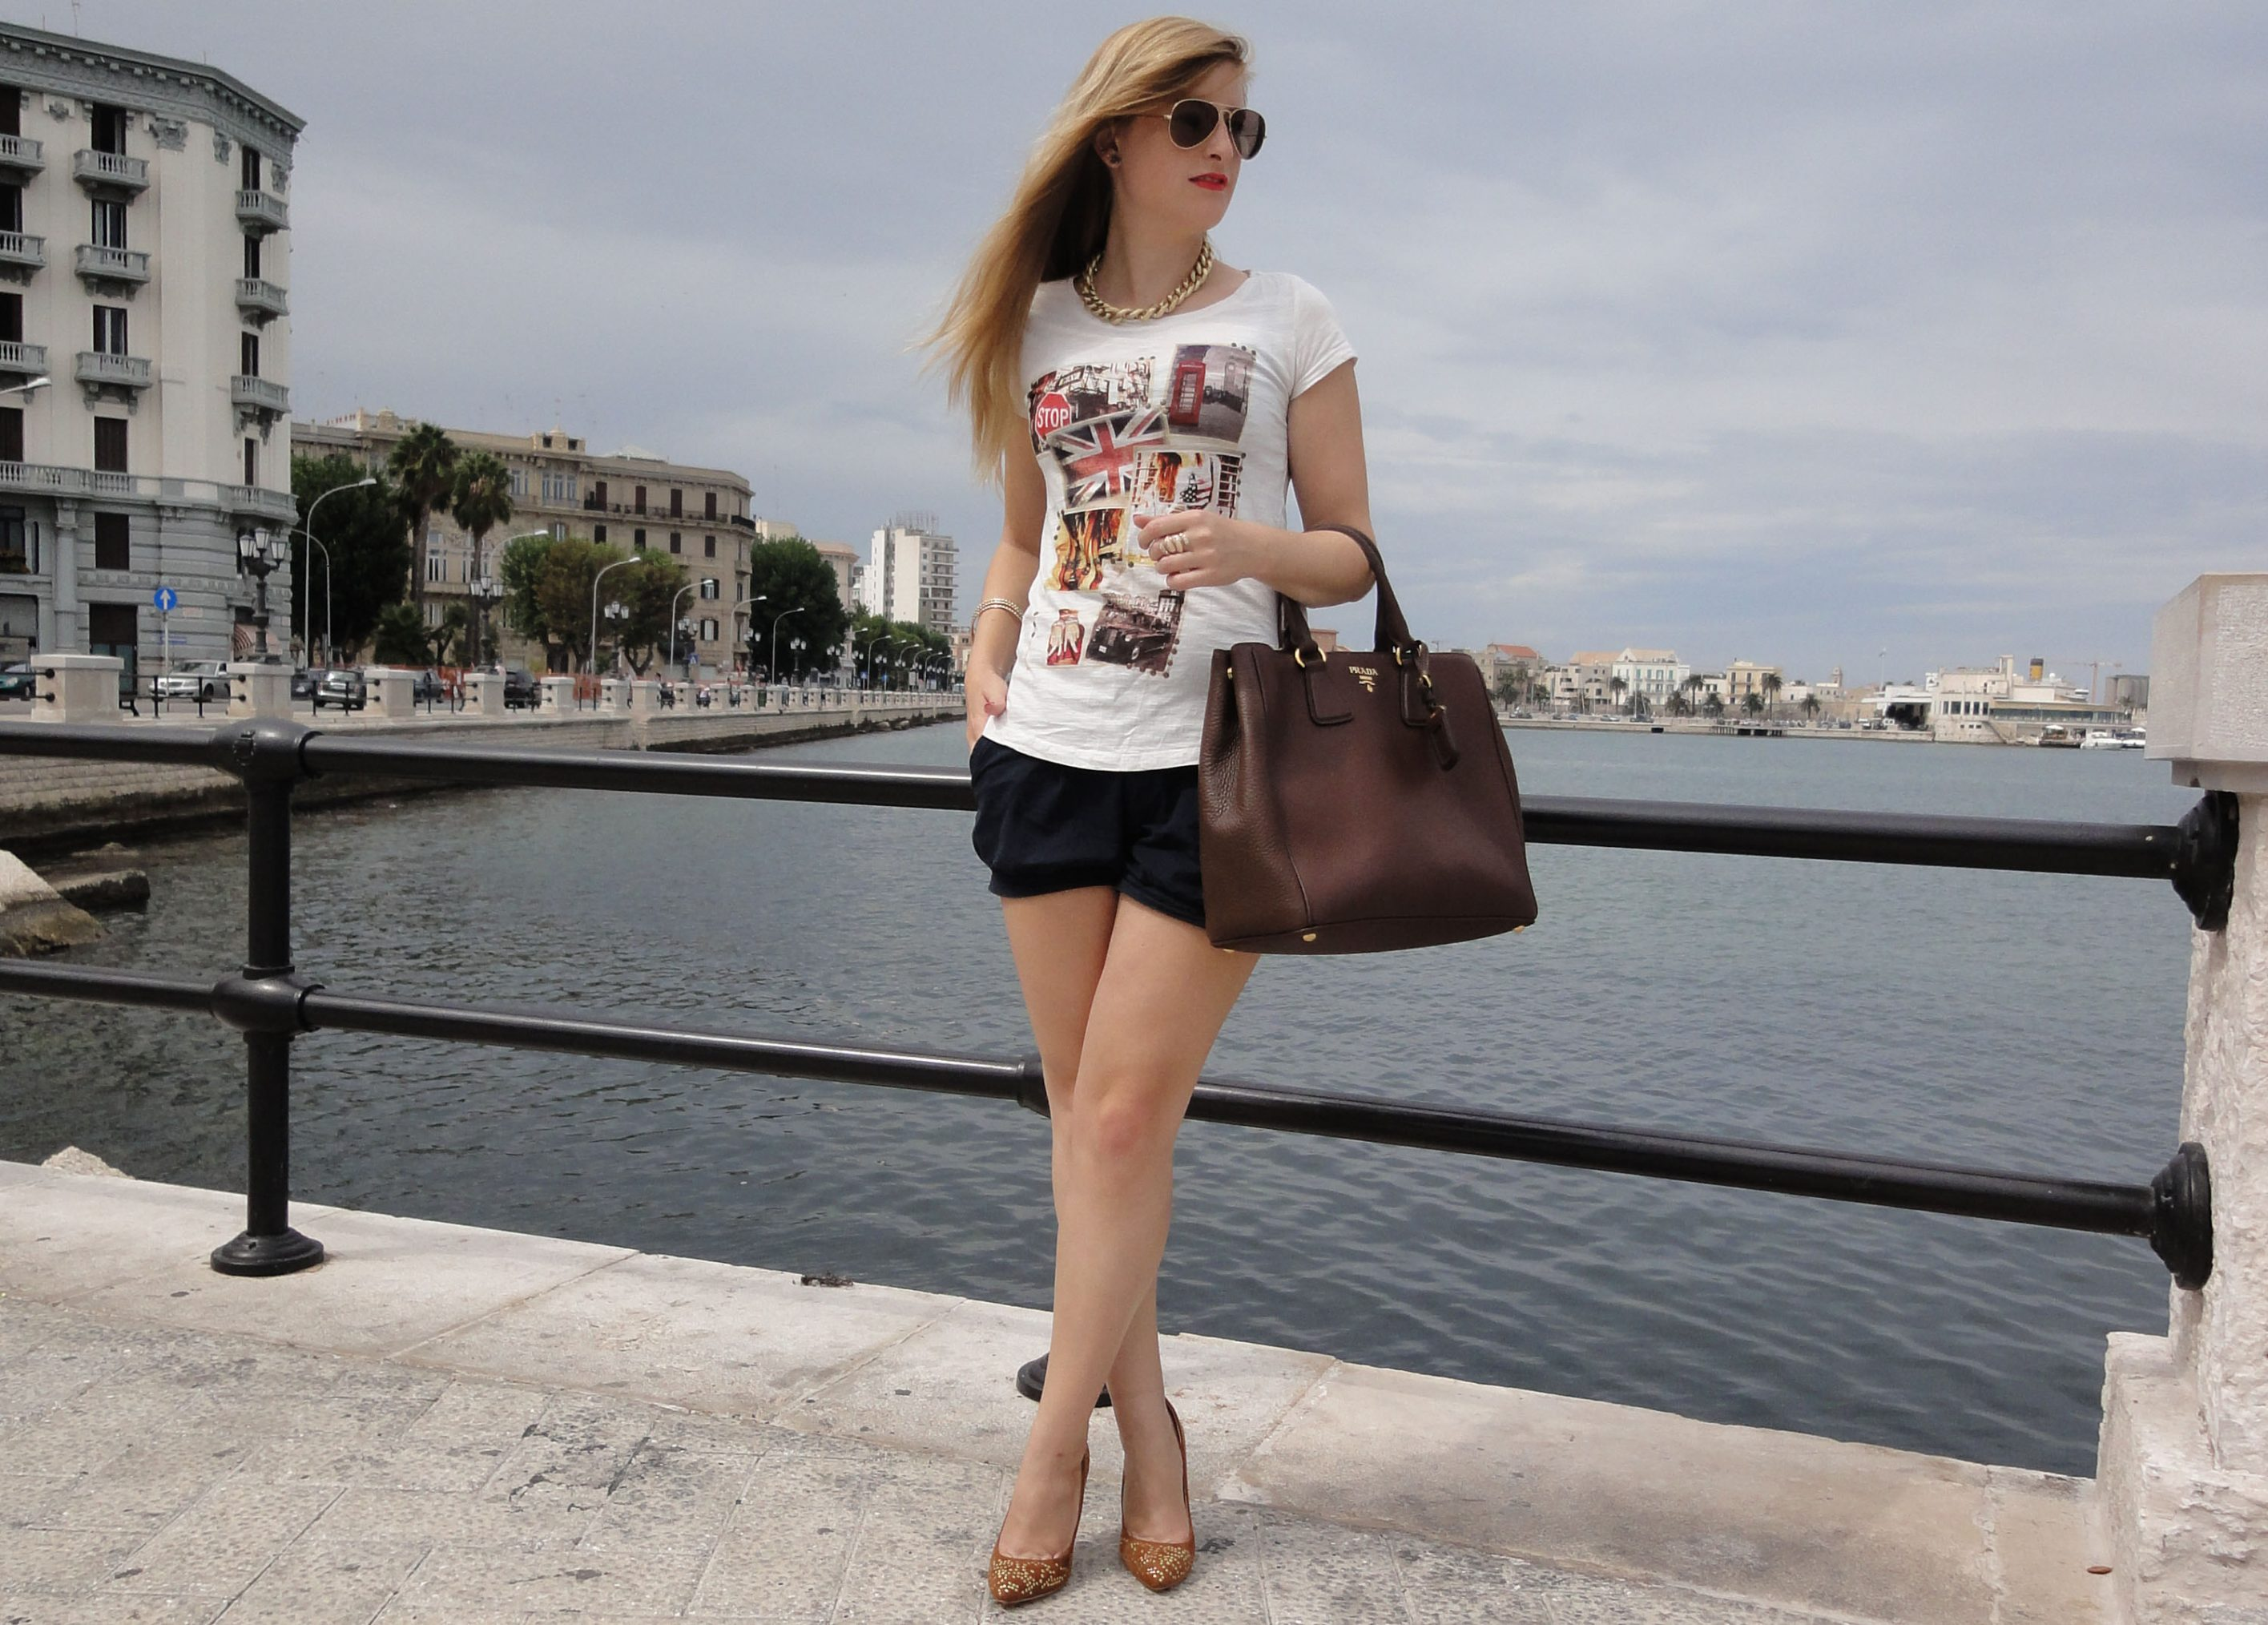 Casual Streetstyle Look printed Shirt Hotpants Heels Bari Italien braune Prada Tasche Modeblog